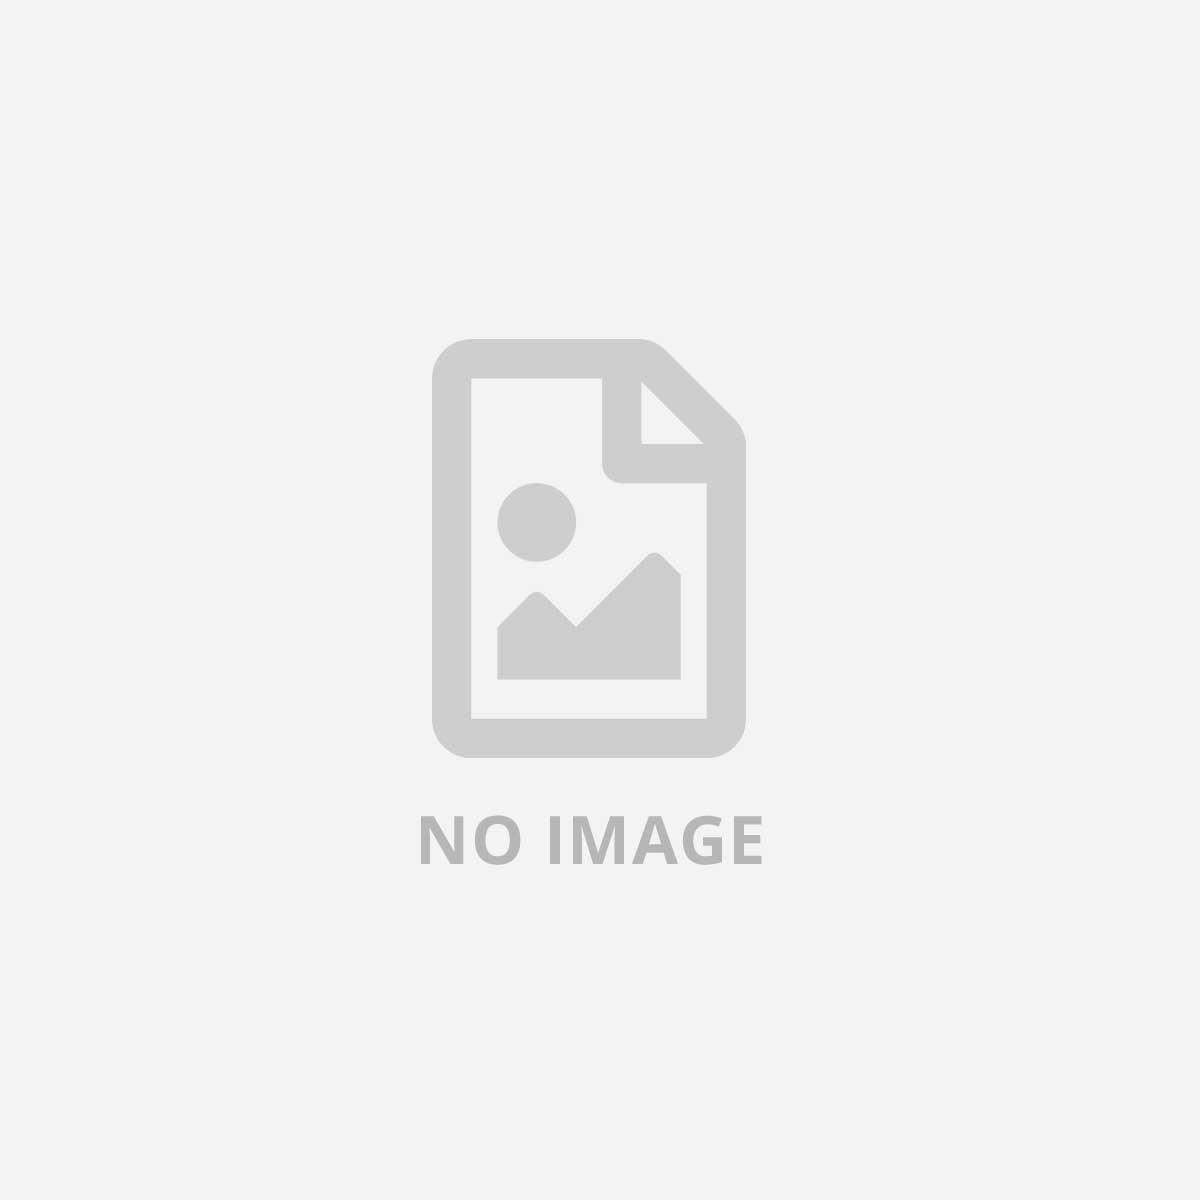 STARTECH SCHEDA PCI A 2 PORTE RS-232